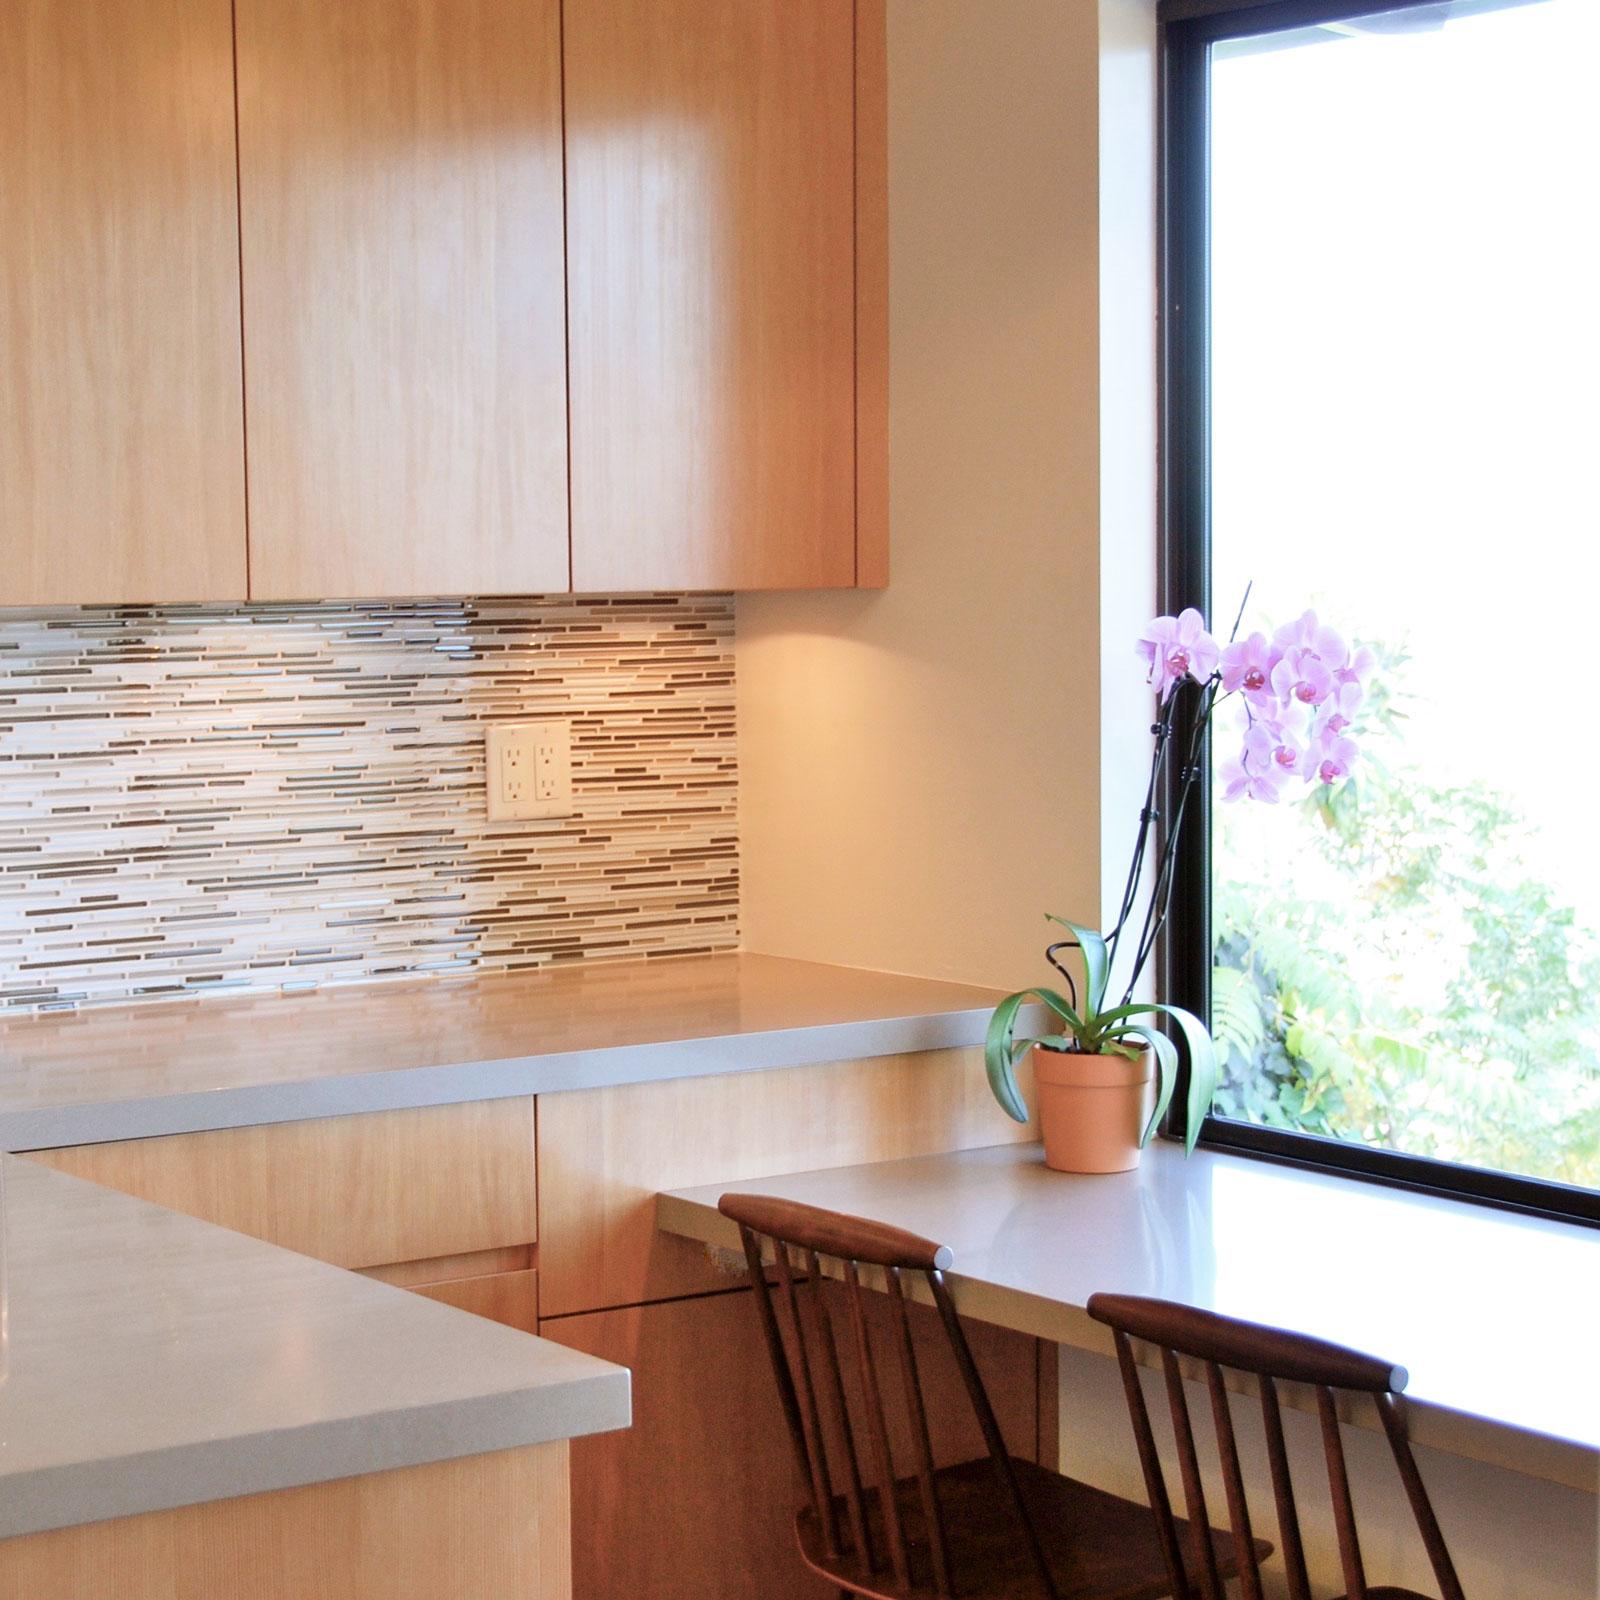 Sharon-Miyano-Interior-Design-Project-Kitchen-Counter-Seating.jpg